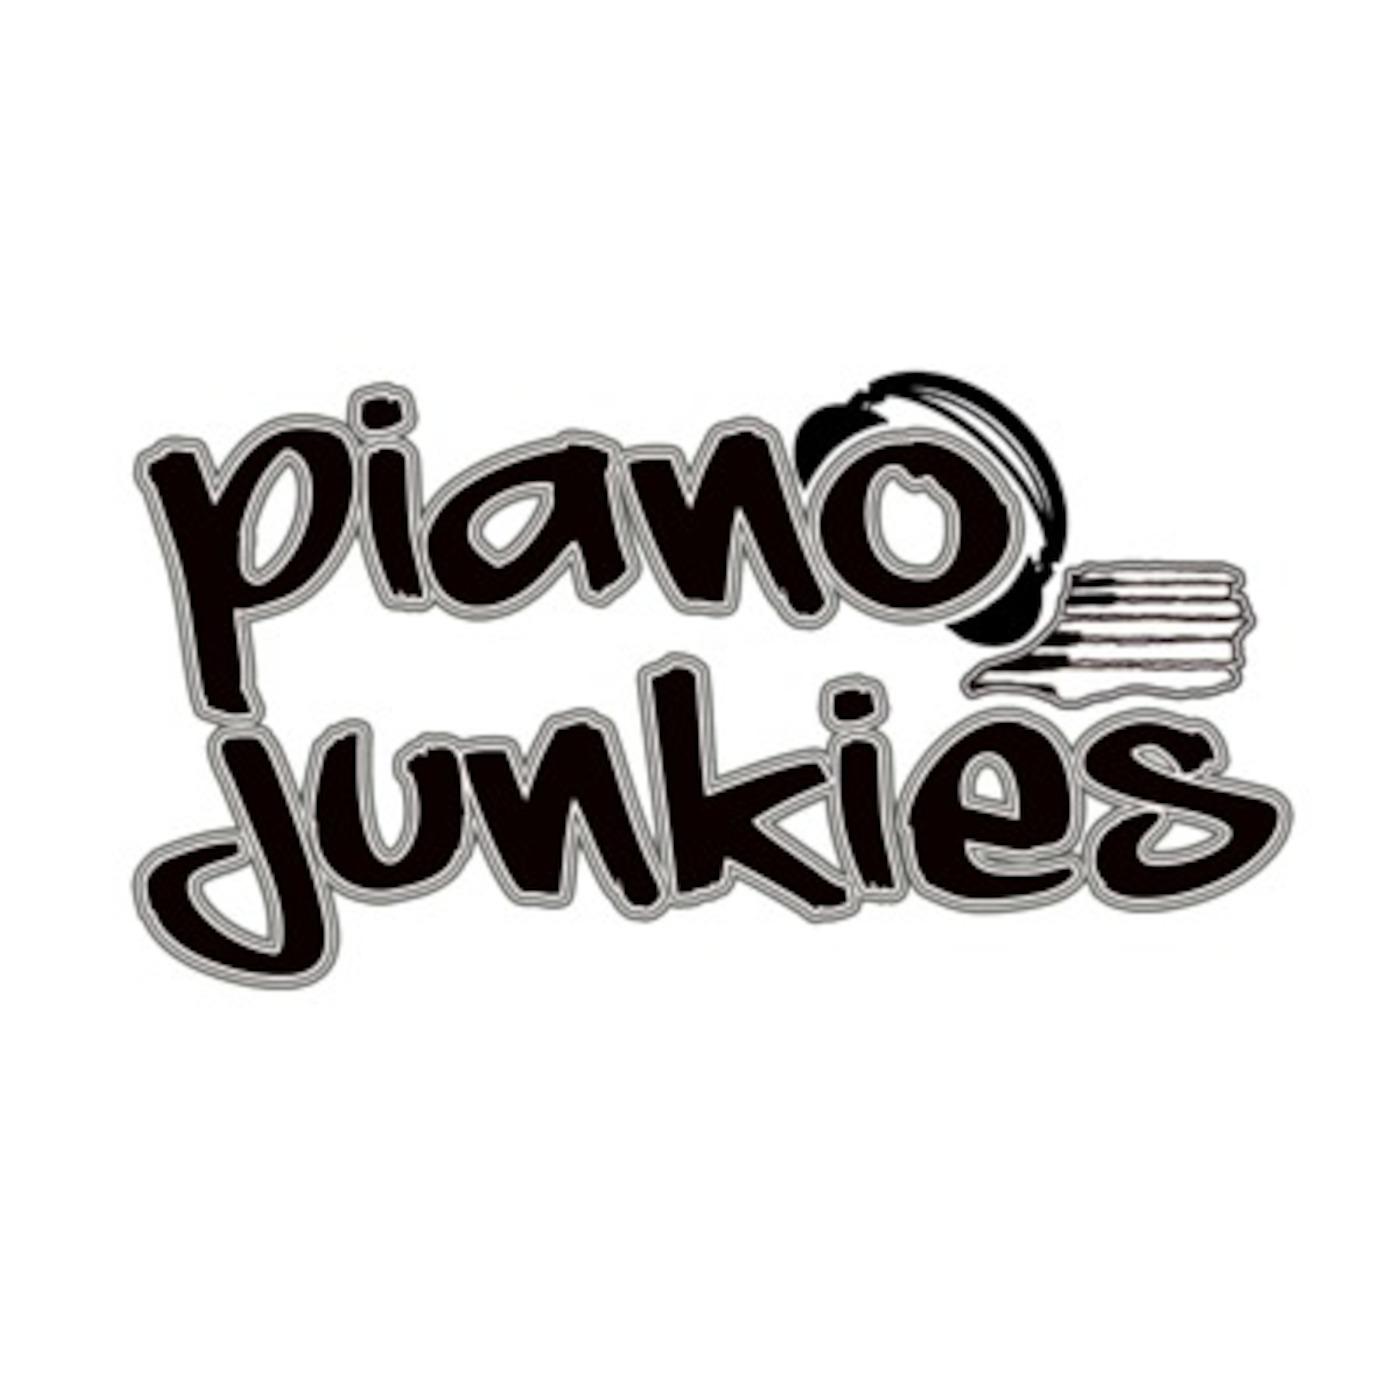 Piano Junkies Podcast